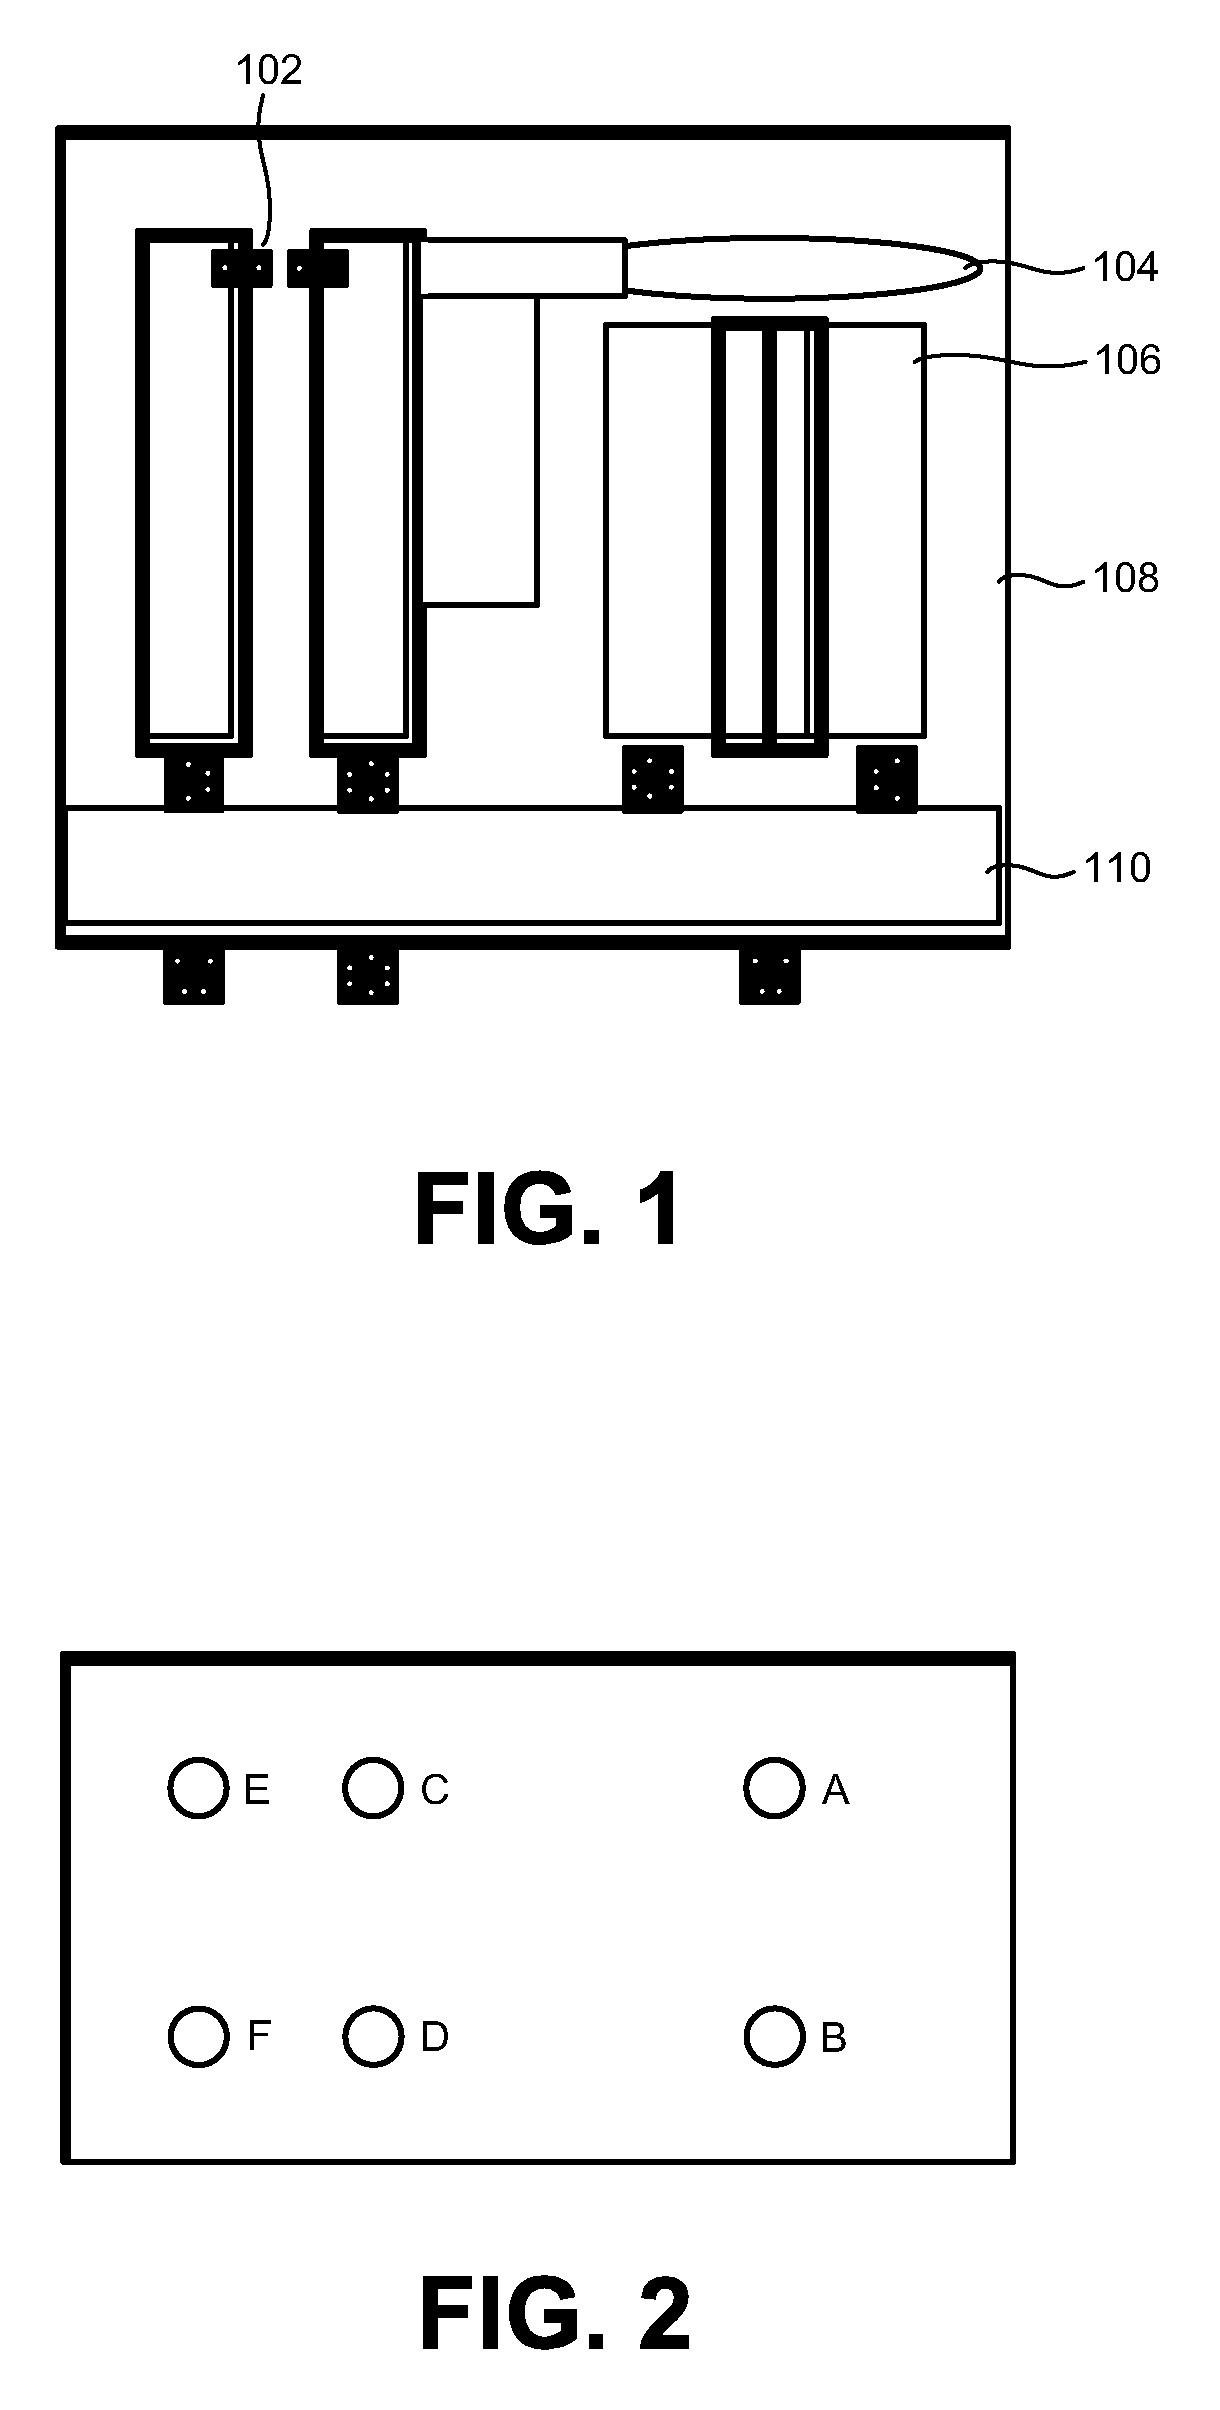 Wiring Diagram Headlamp Relay Valid Headlight Relay Wiring Diagram Best Patent Us Electromechanical